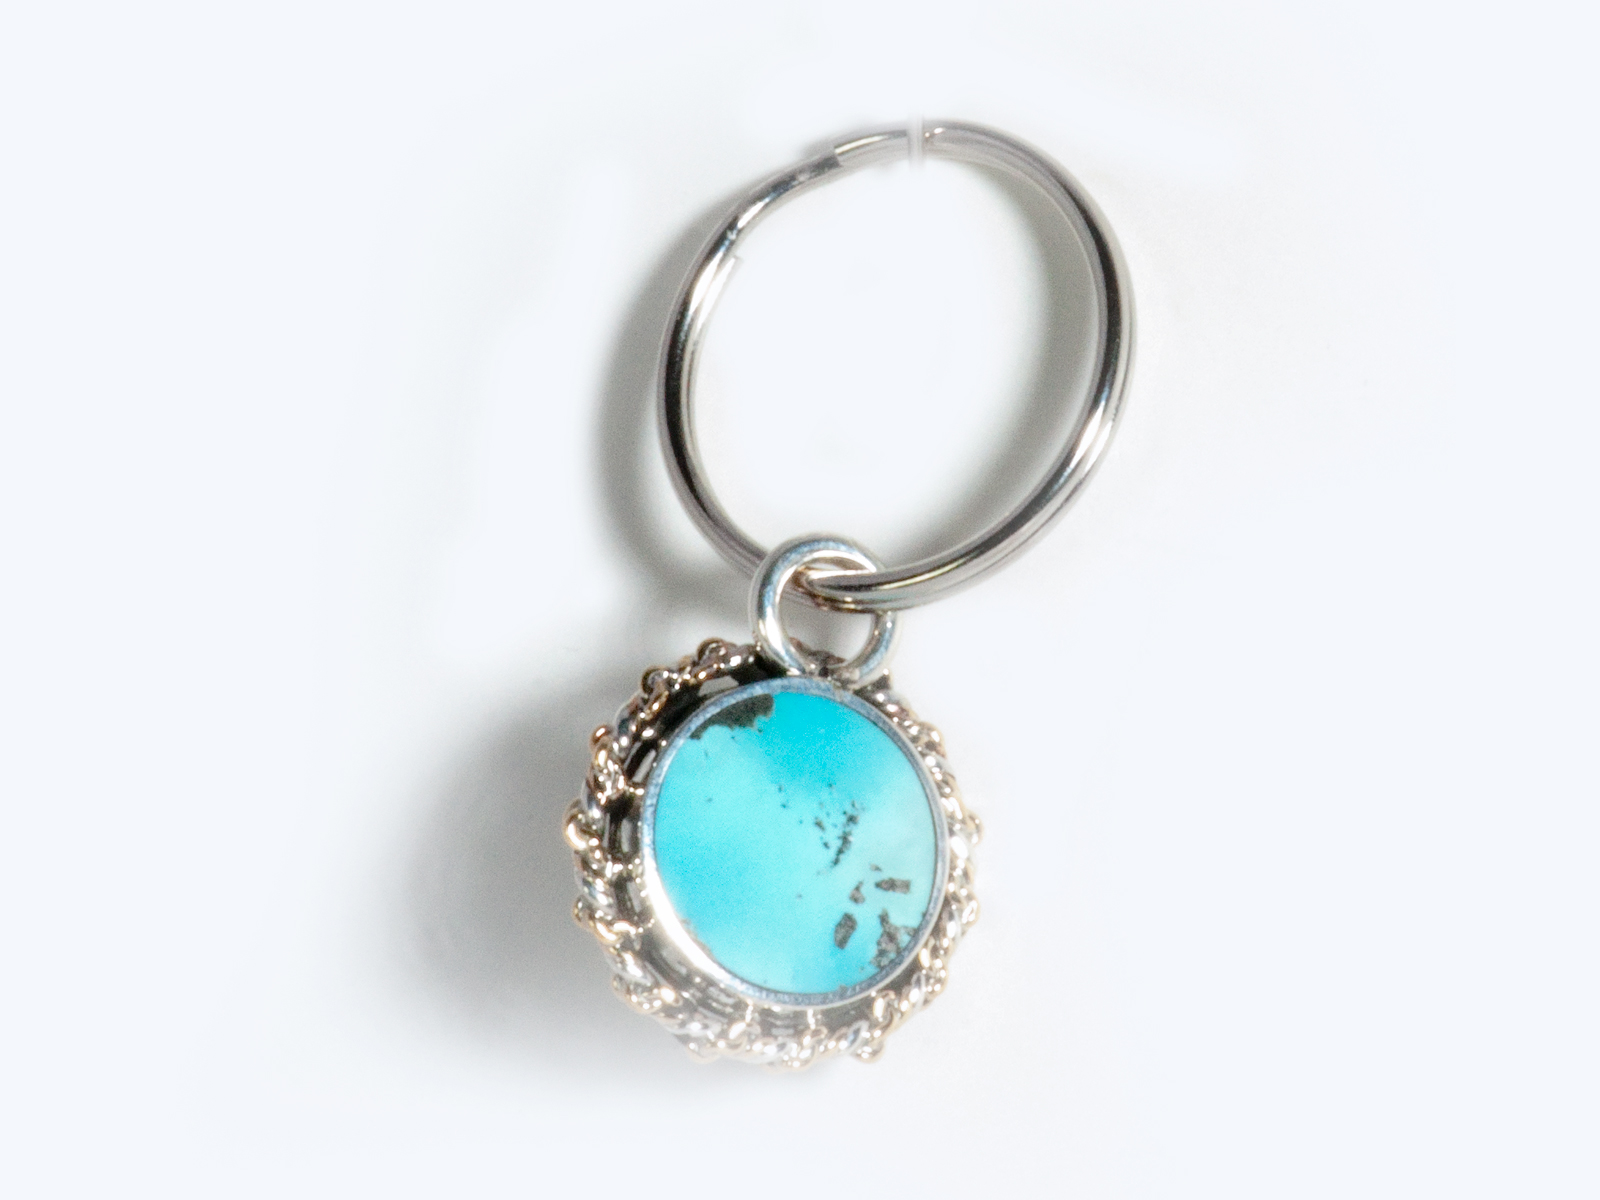 Turquoise Key Chain